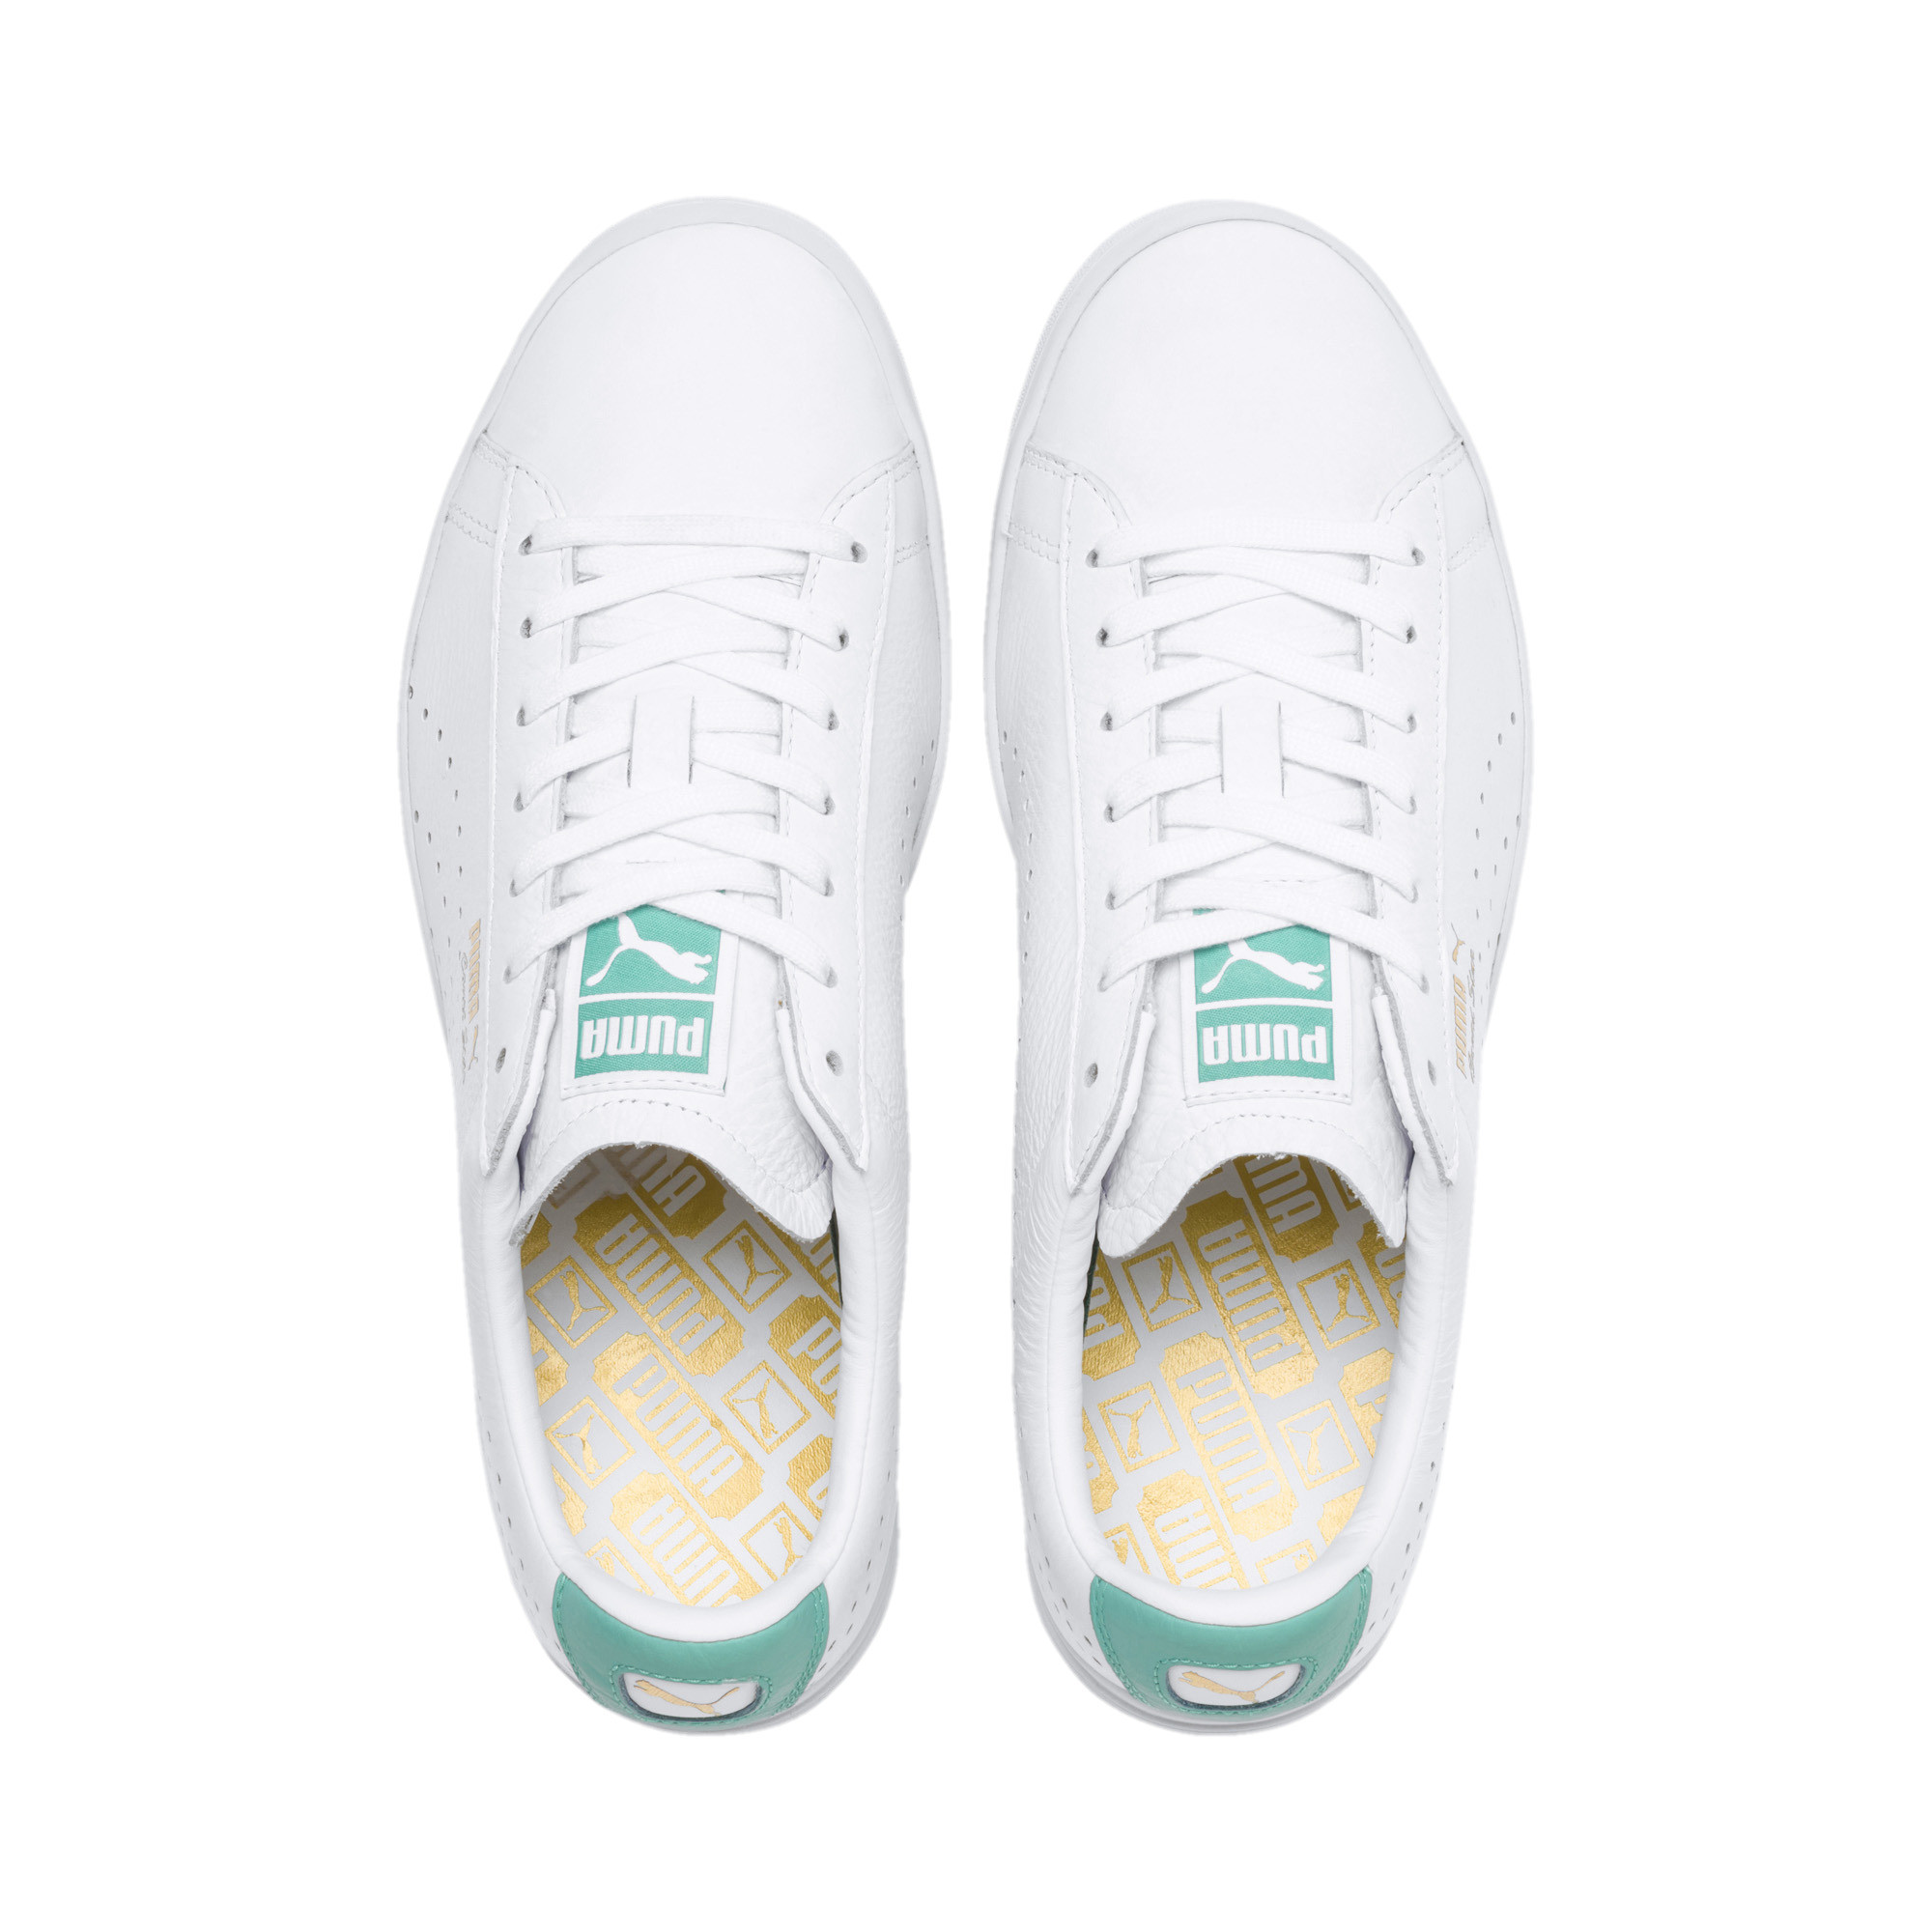 PUMA-Court-Star-Men-039-s-Sneakers-Unisex-Shoe-Sport-Classics thumbnail 8